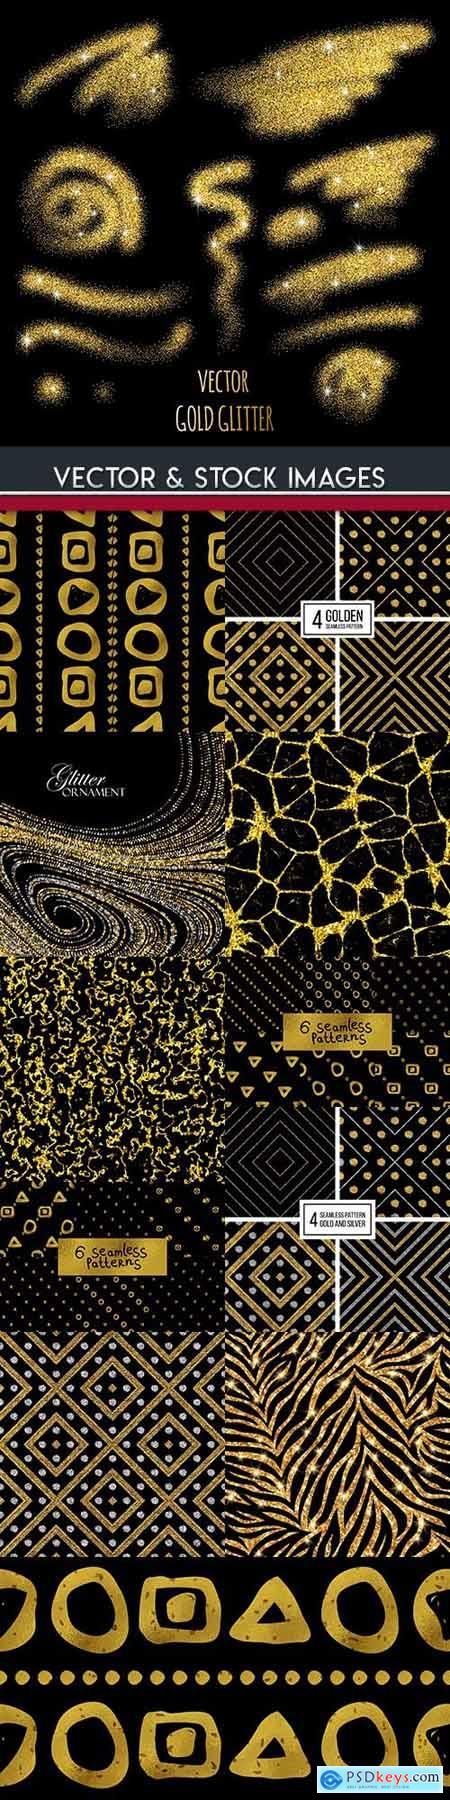 Gold glitter abstract design seamless pattern